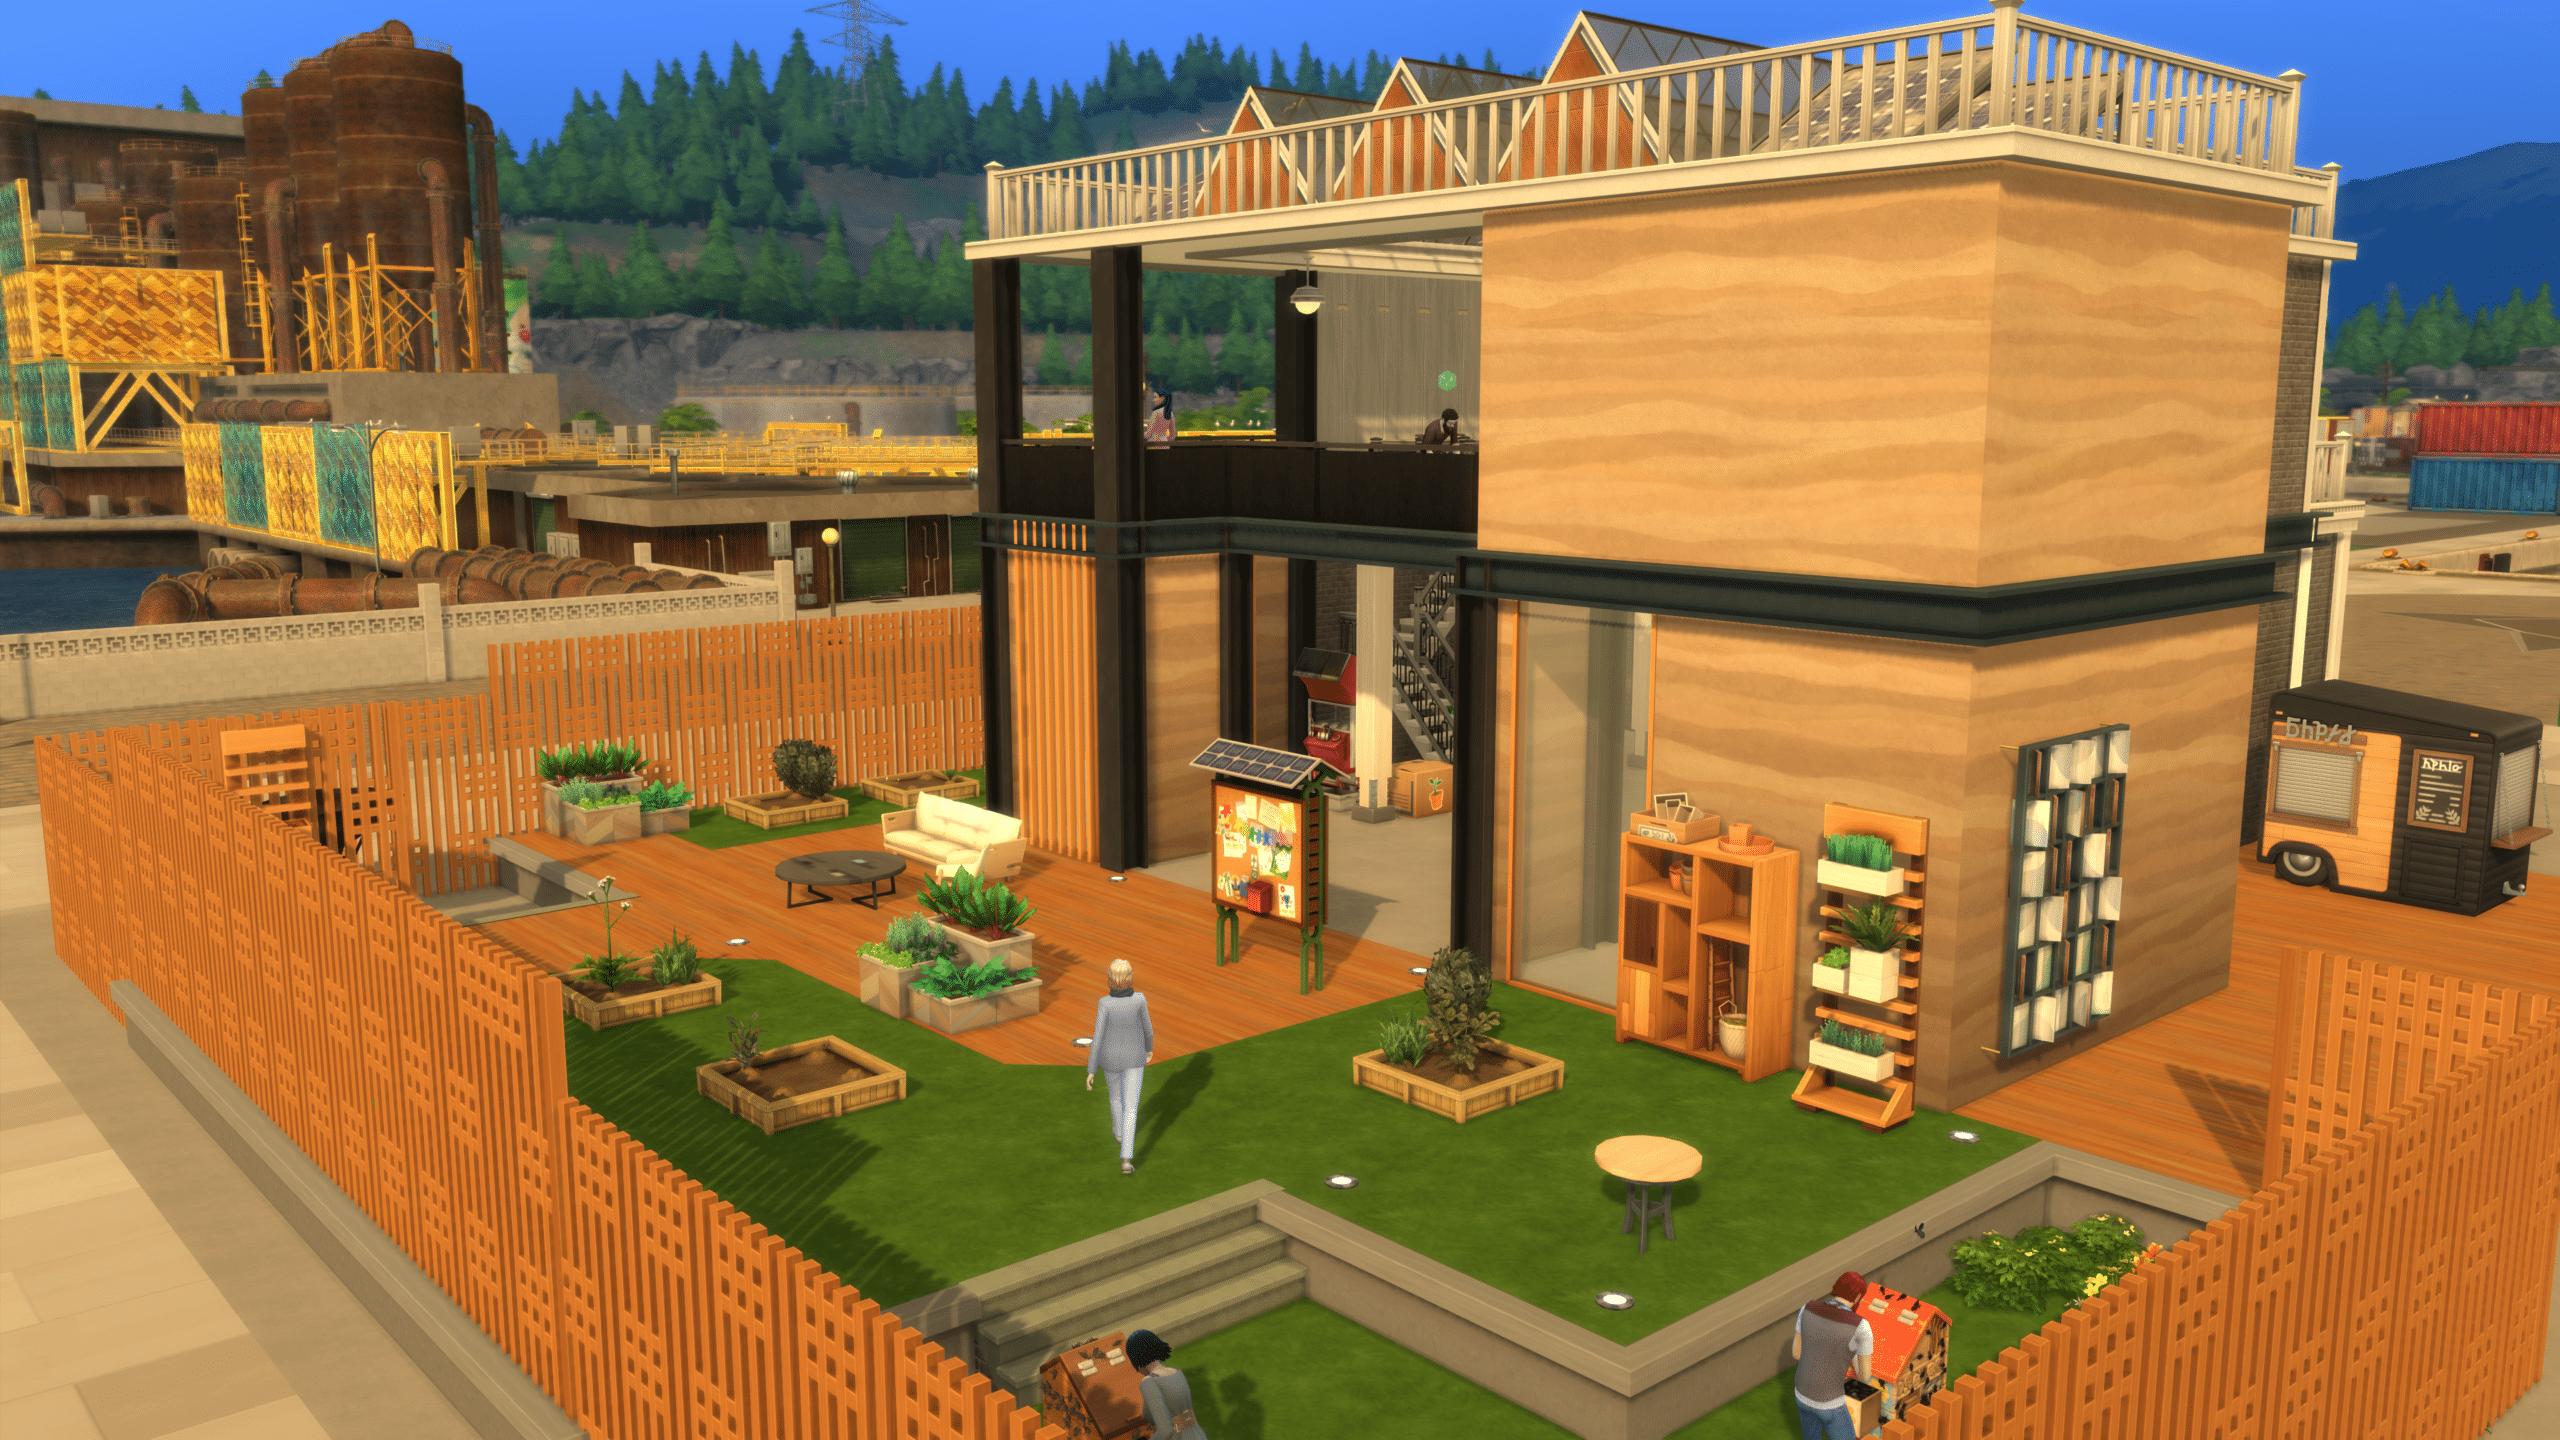 De Sims Ecologisch Leven